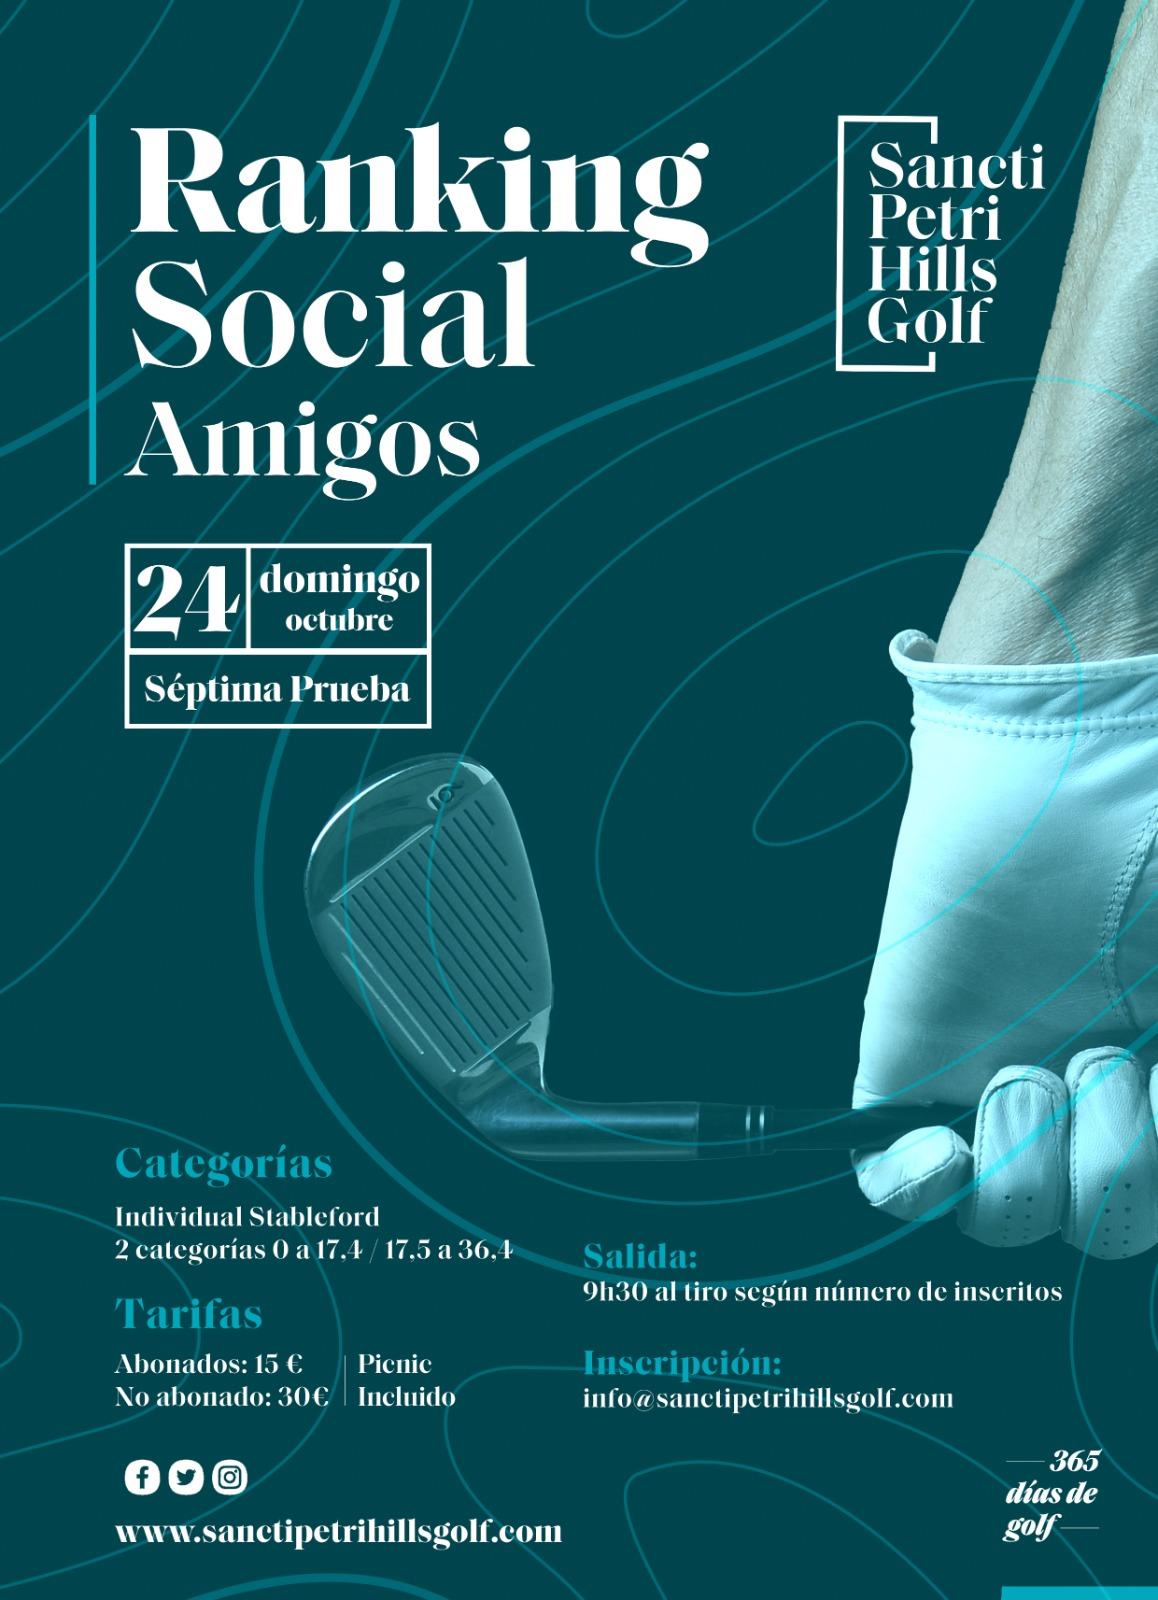 7ª Prueba | Ranking Social Amigos Sancti Petri Hills Golf Race to 2022